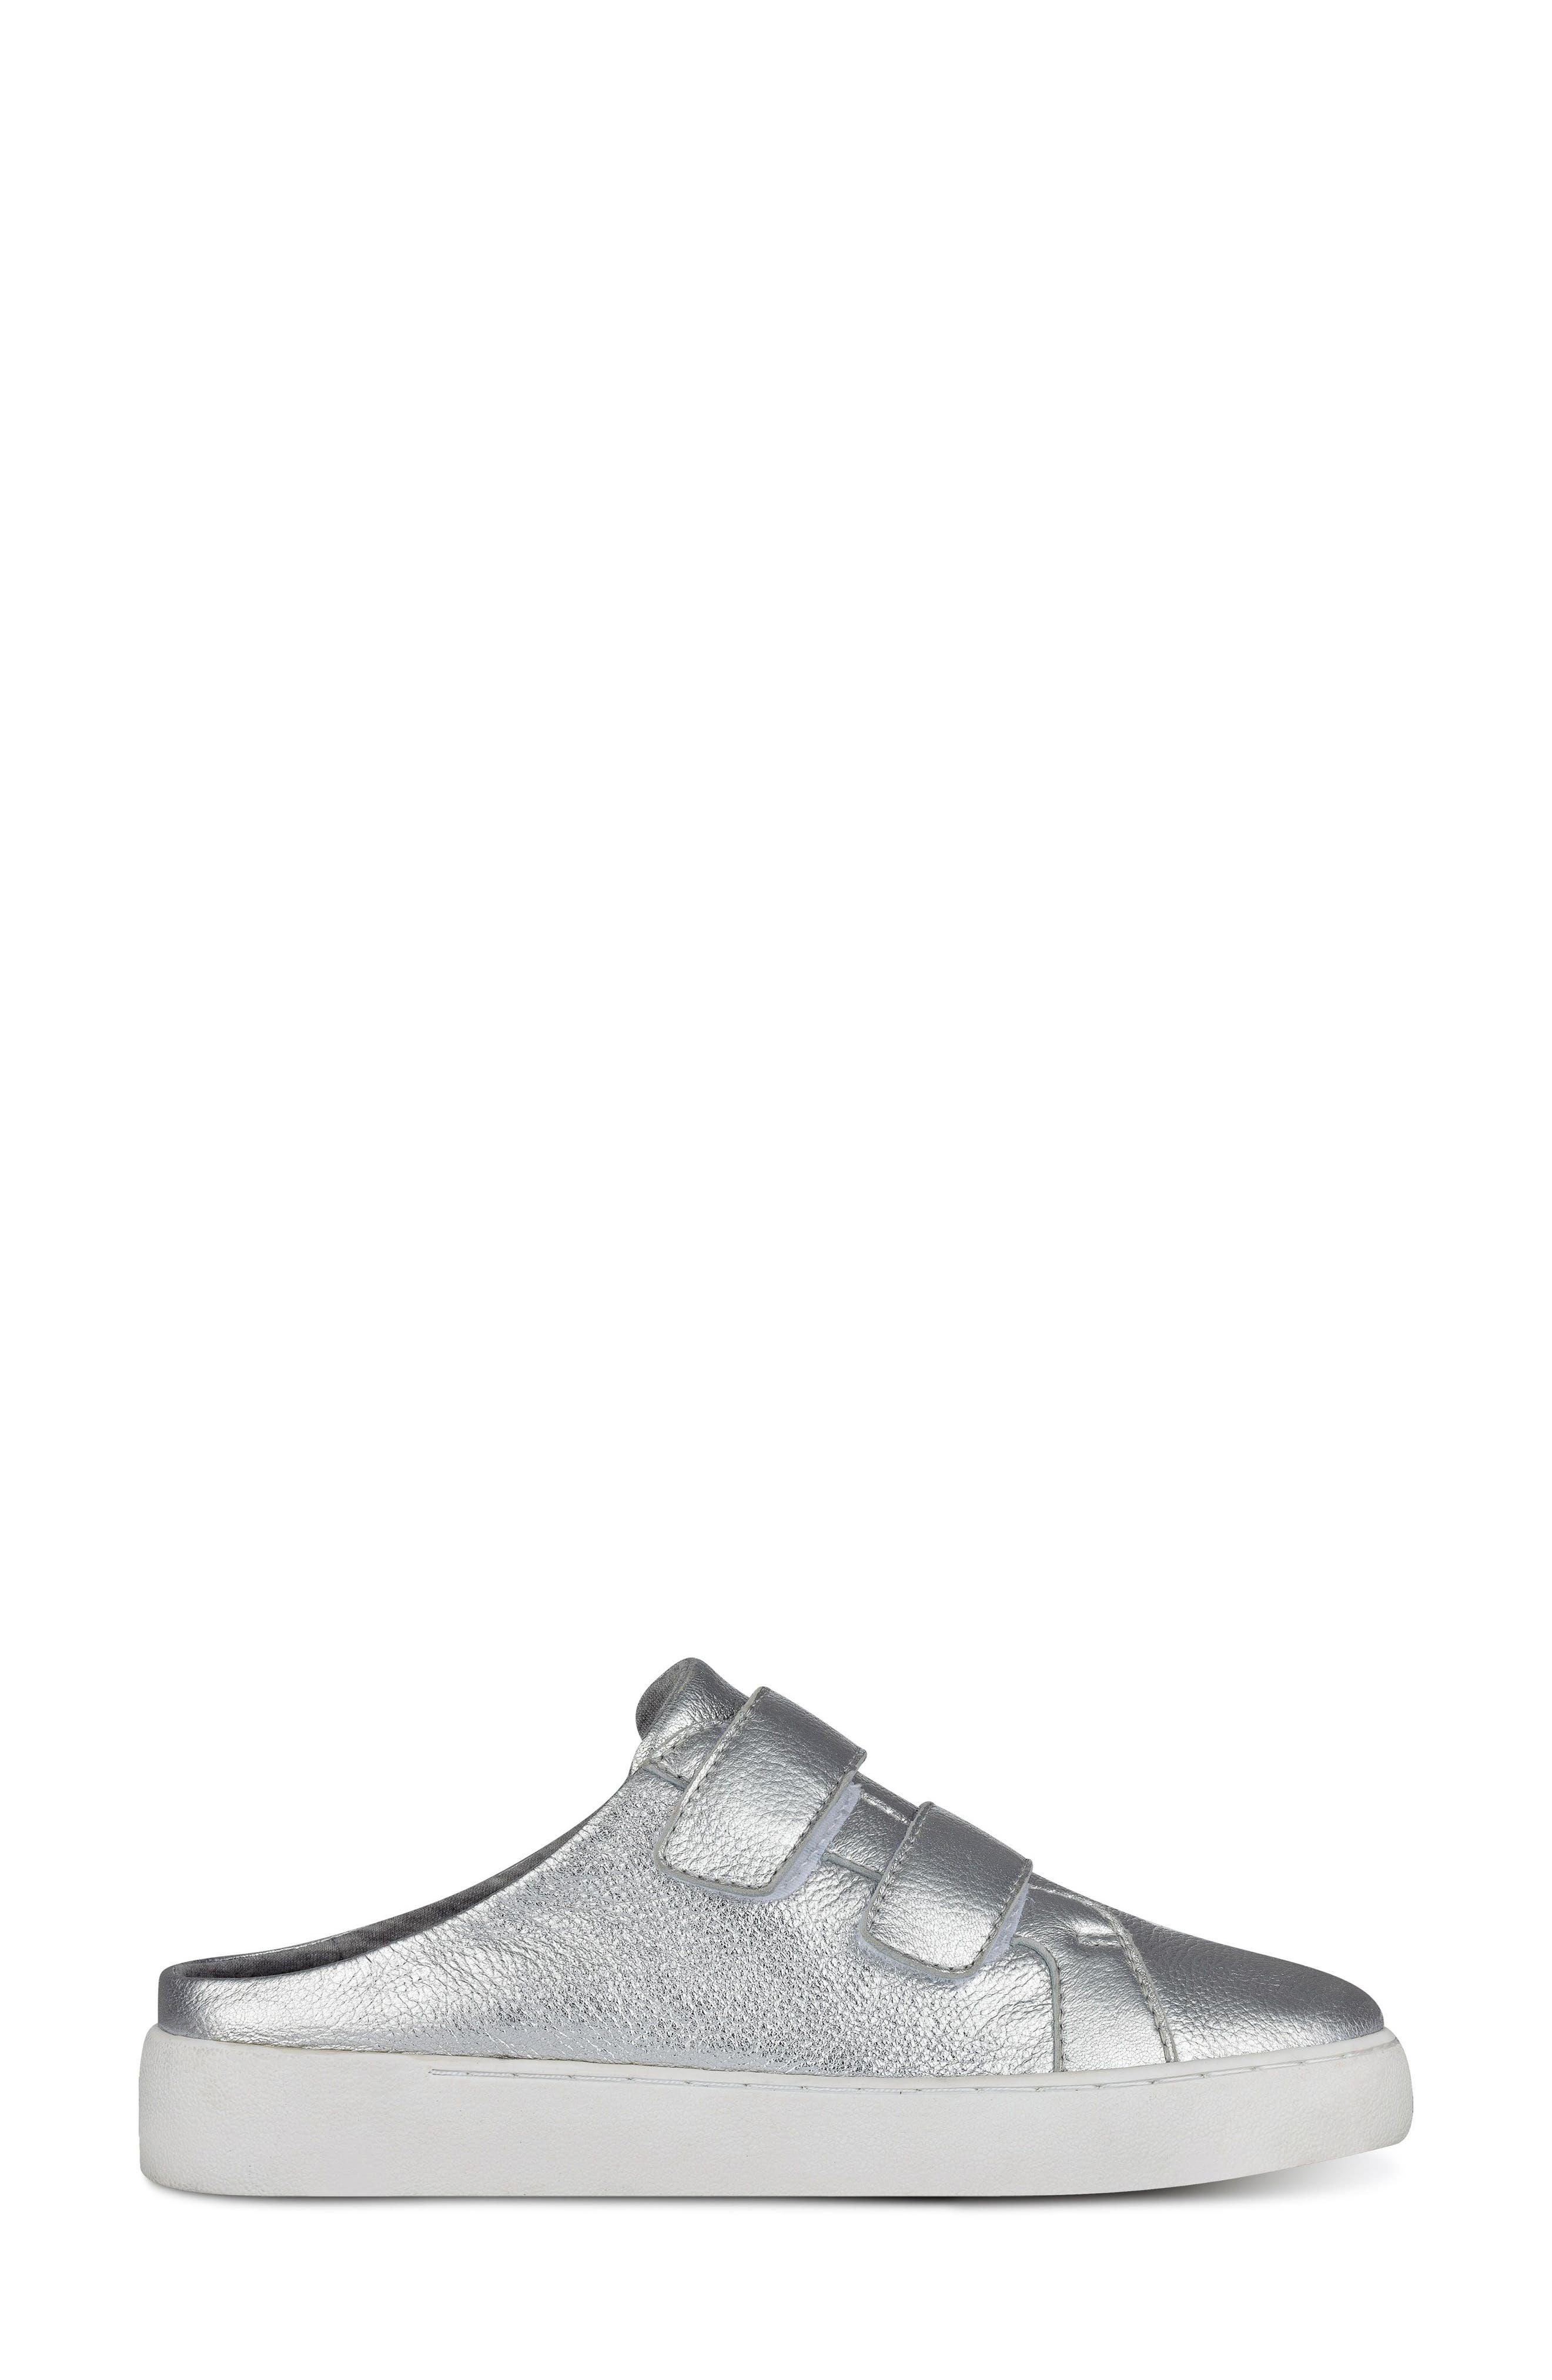 Alternate Image 3  - Nine West Poeton Sneaker Mule (Women)